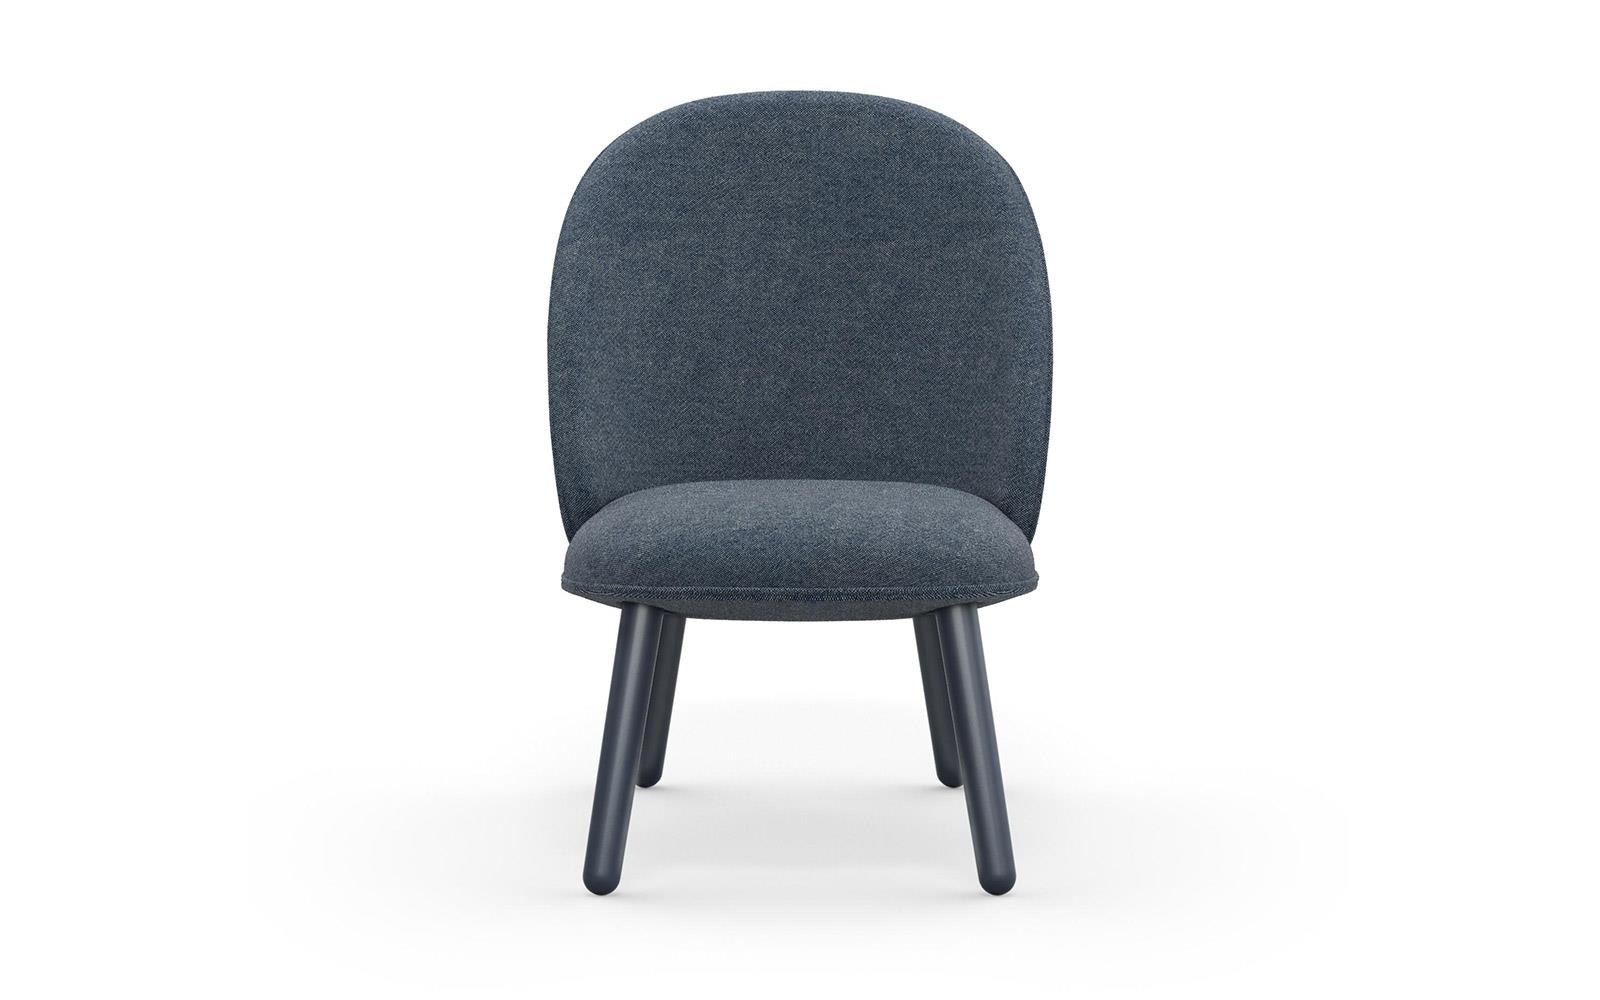 Ace Lounge-Sessel - Ein flach-verpacktes Polstermöbel